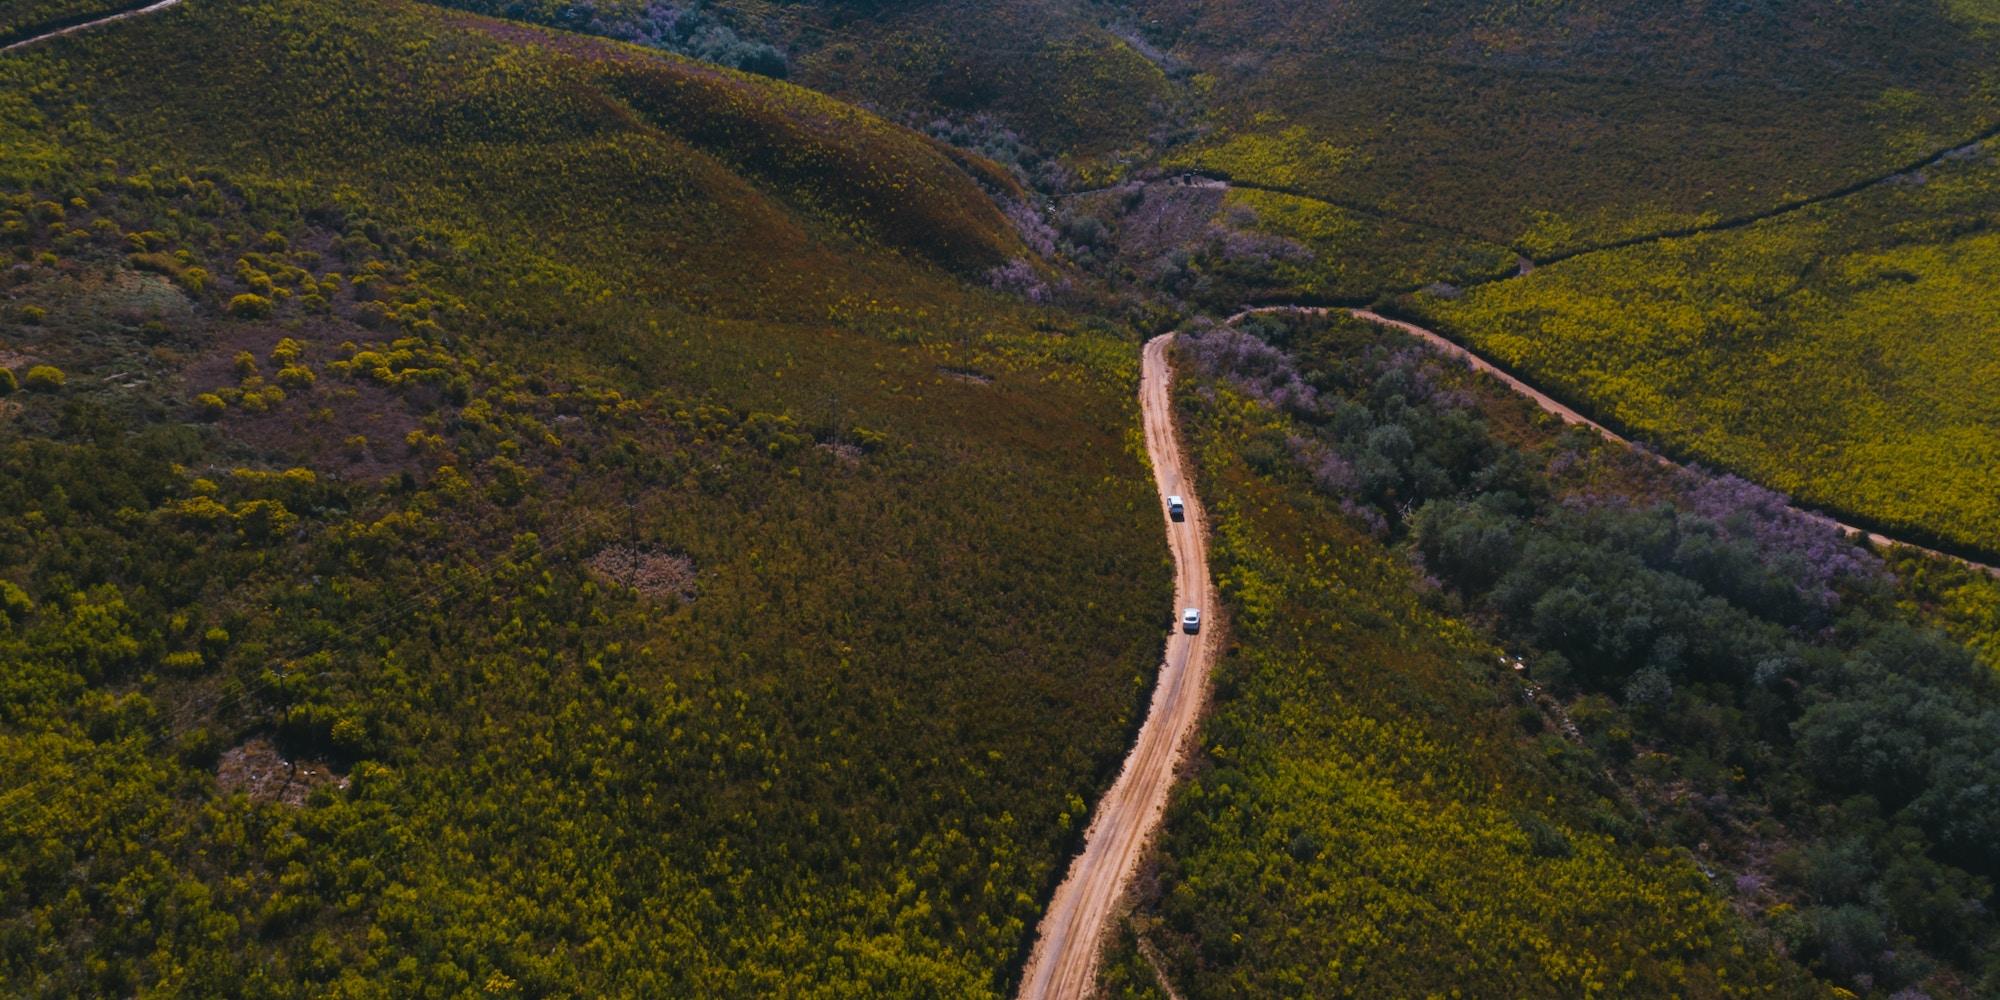 Marloth Nature Reserve 3 credit Shawn Ugulu